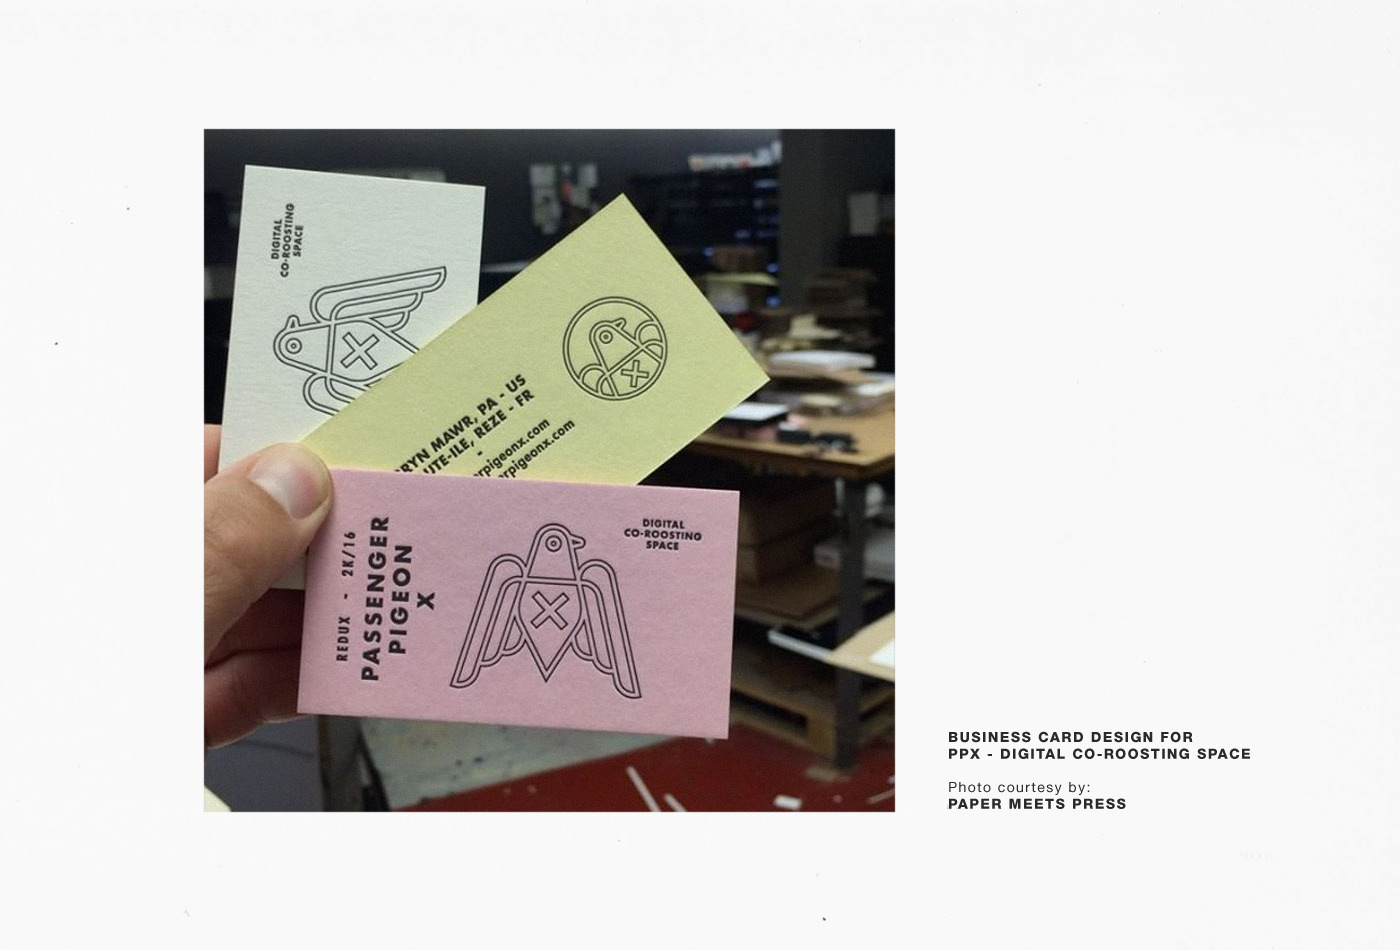 ppx-digital-co-roosting-space-philadelphia-nantes-papermeetpress-vacaliebres-businesscard-letterpress